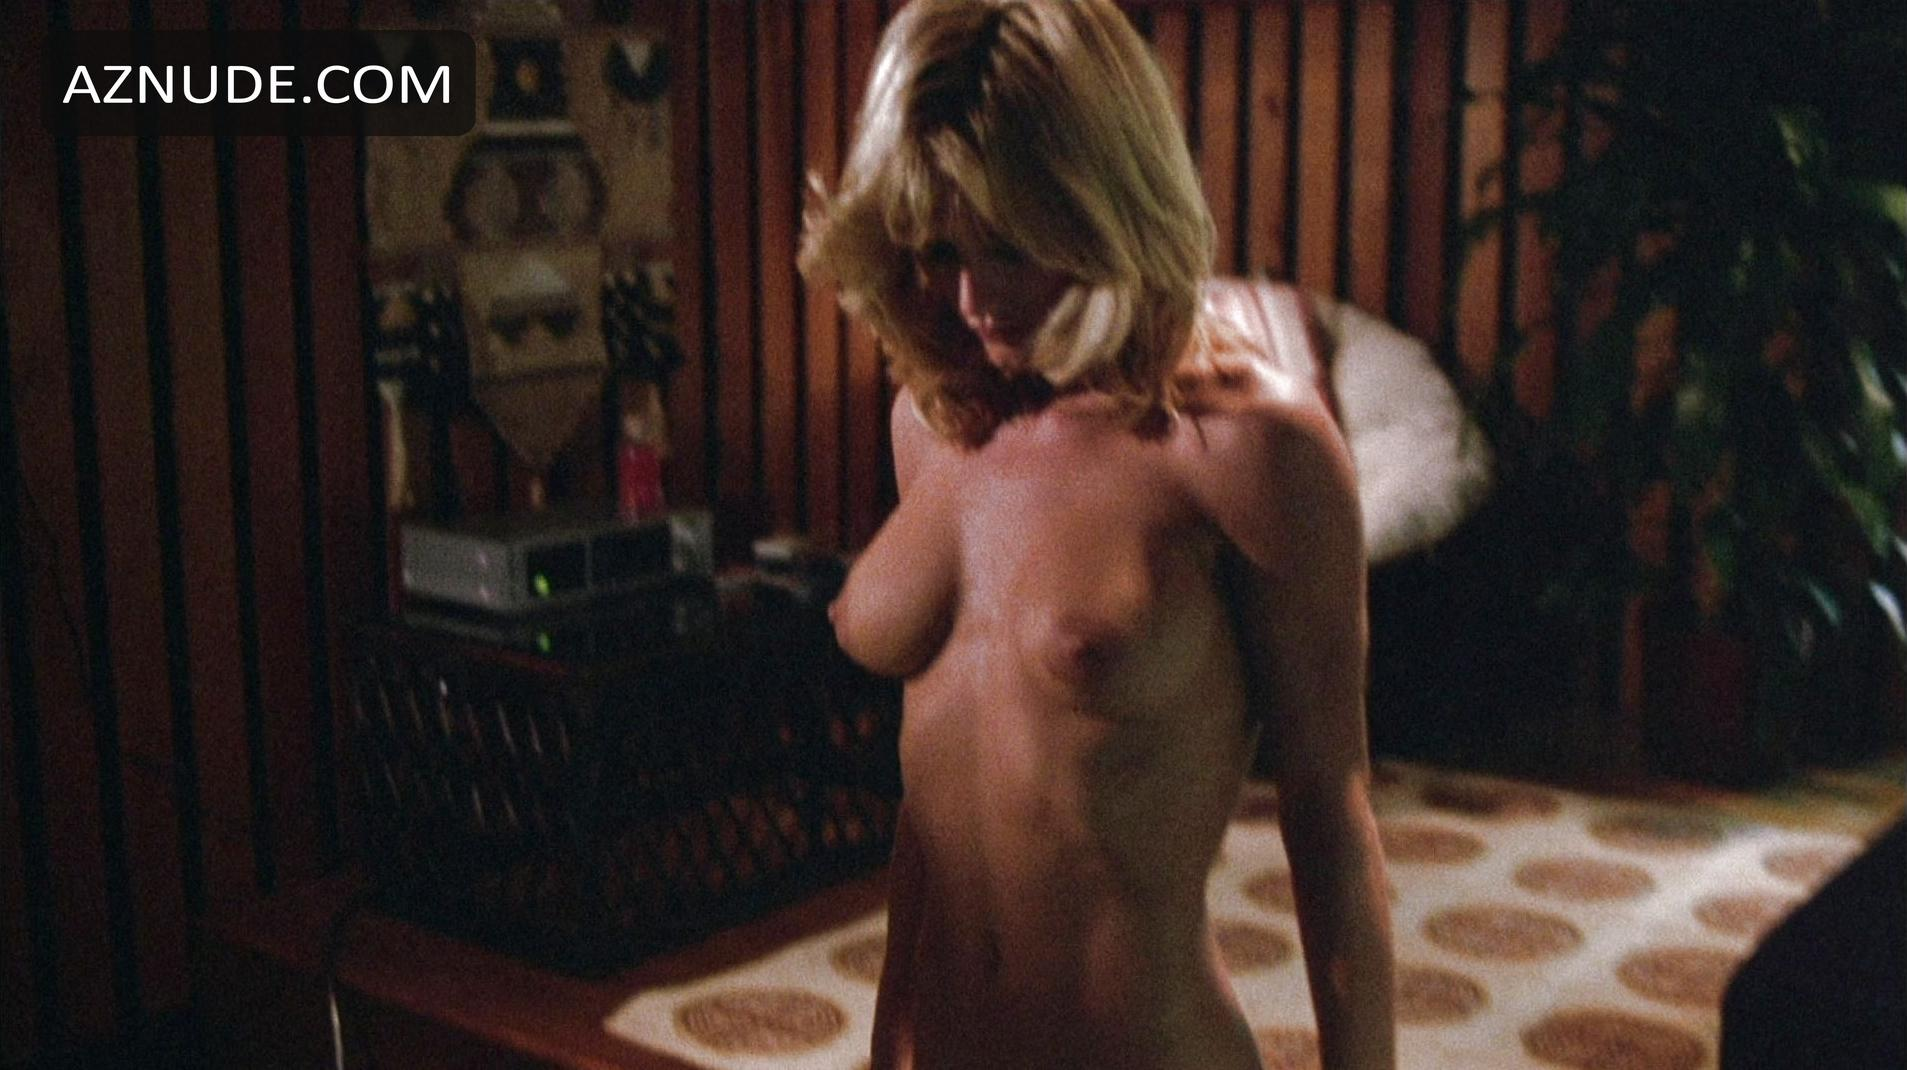 randi hot nude pics